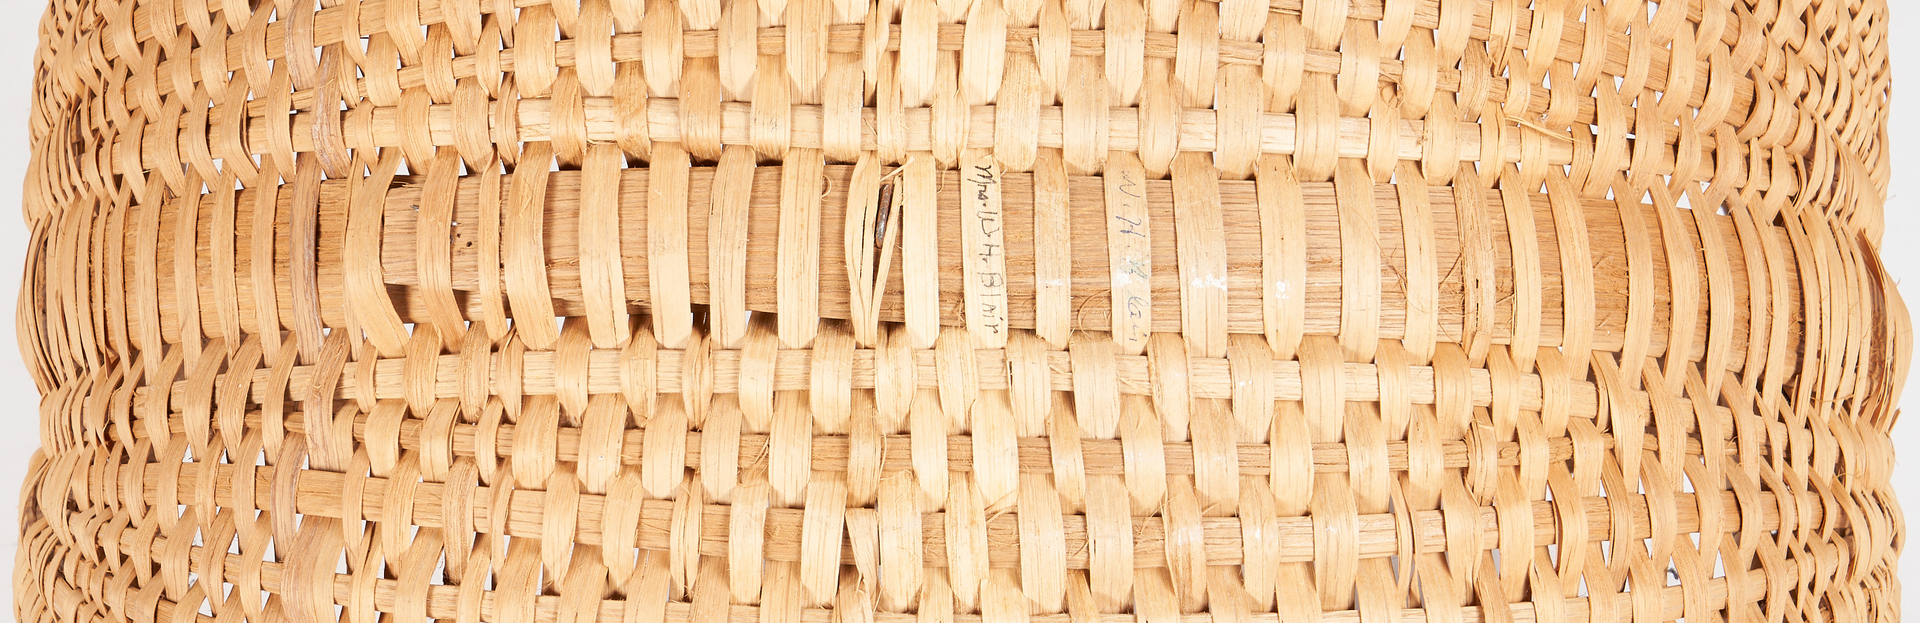 Lot 1061: Large Signed Southern Oak Buttocks Basket, Cannon County, TN